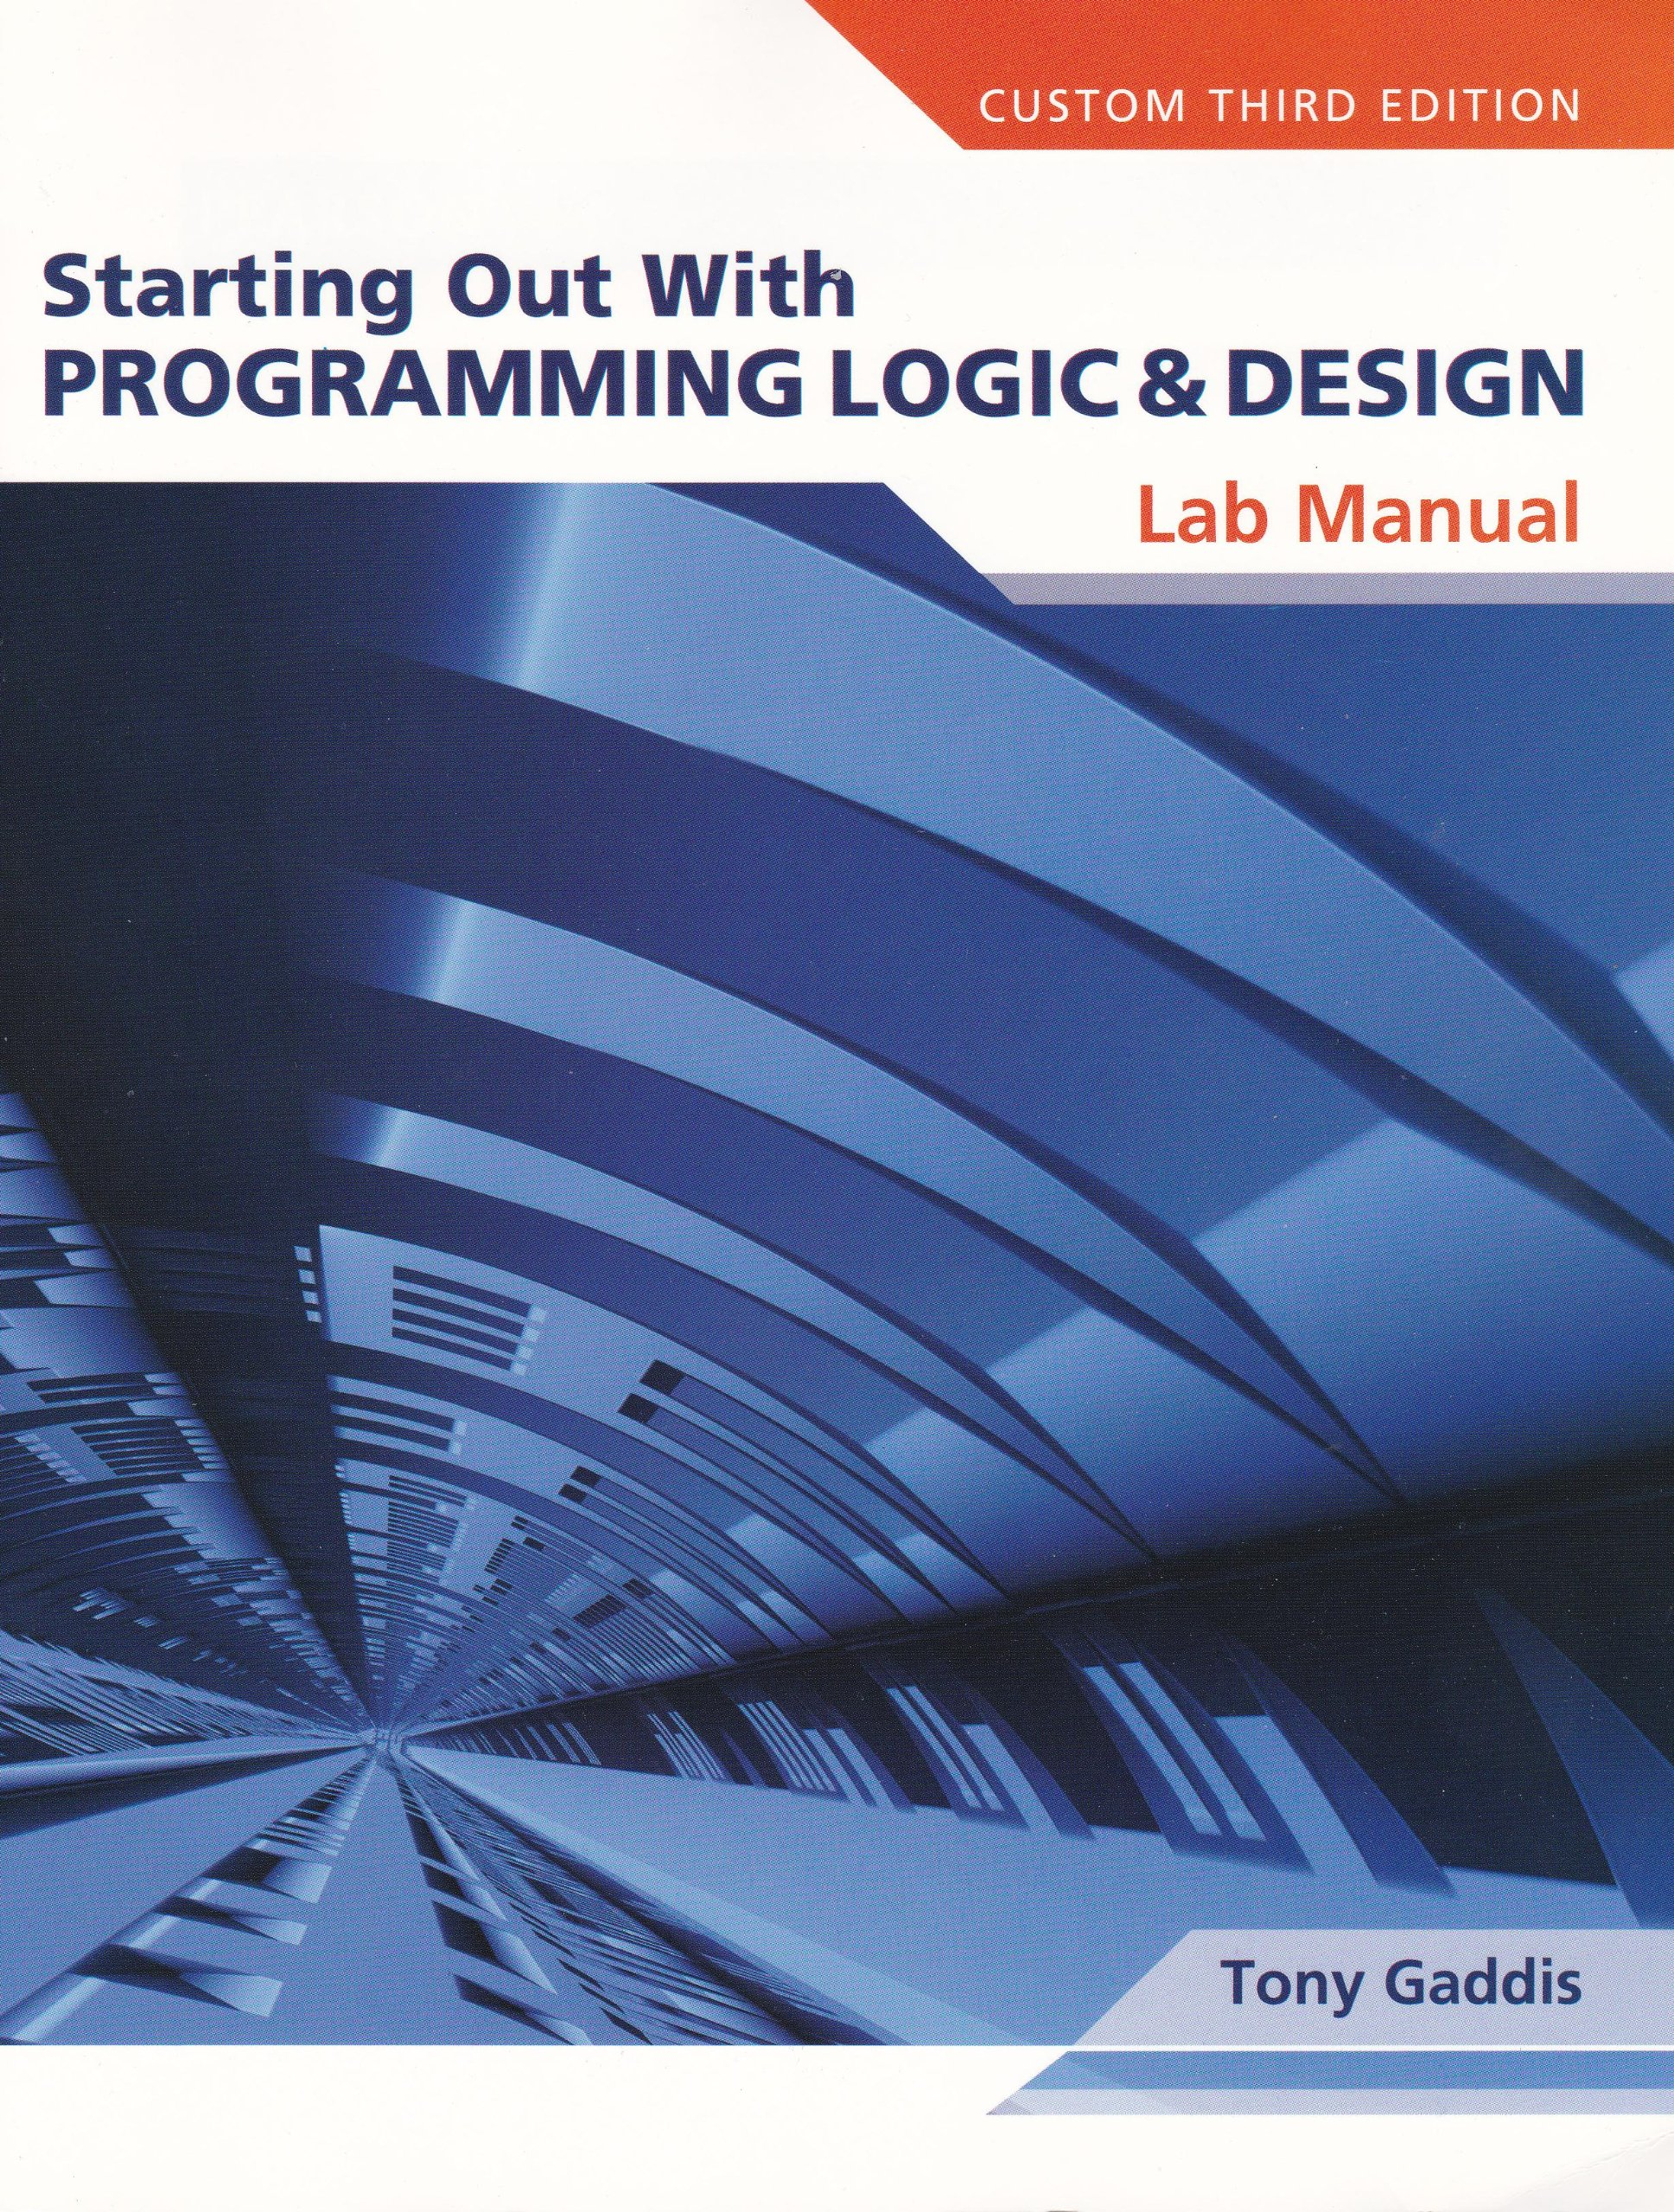 lab manual for starting out with programming logic design tony rh amazon com Programming Logic Controller Logic Programming Languages